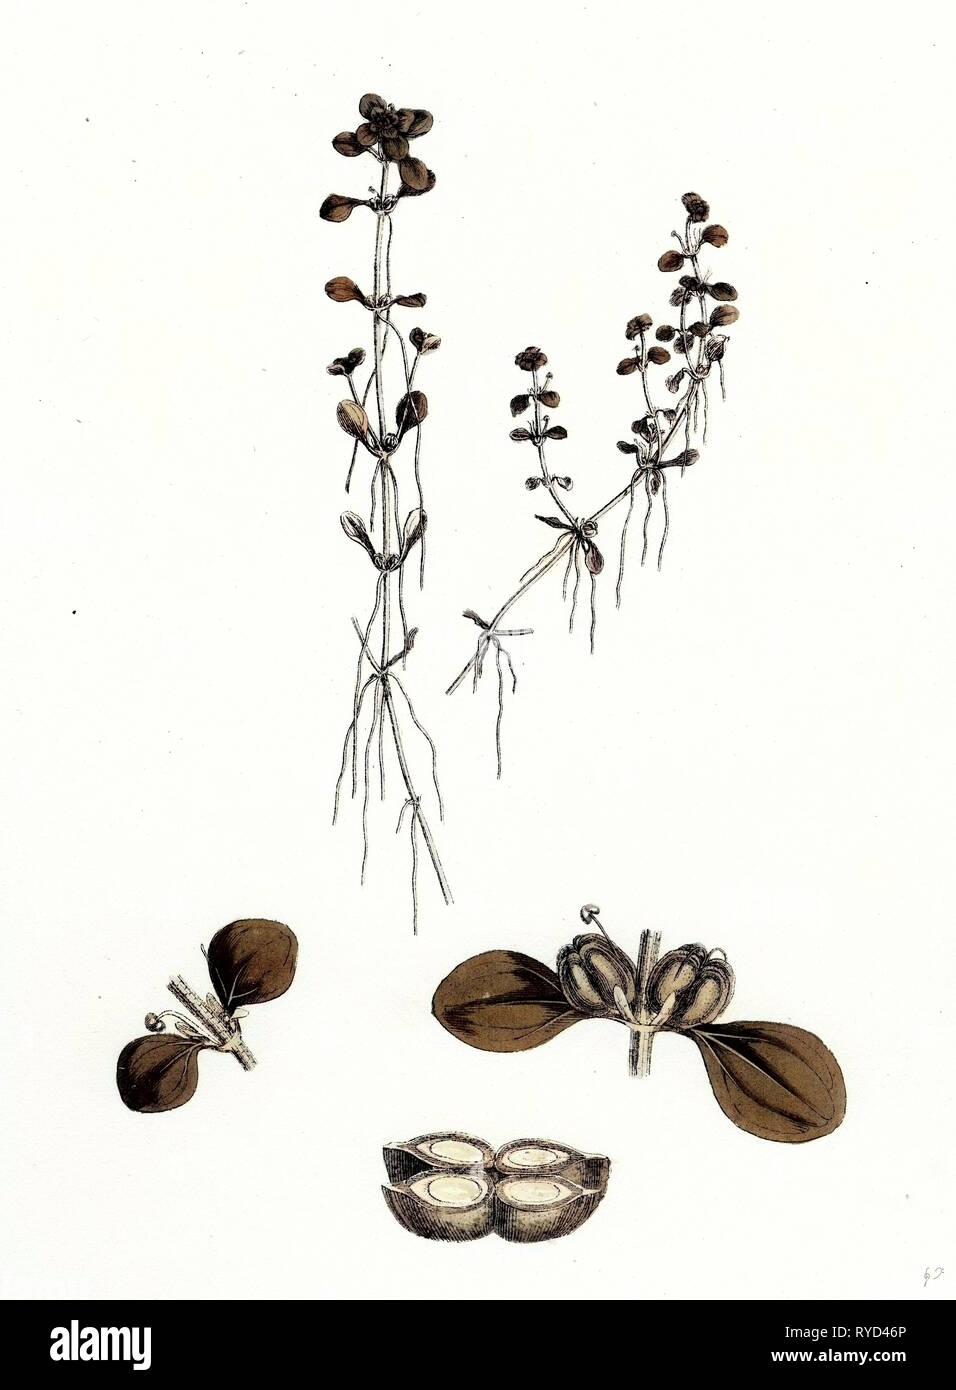 Callitriche Platycarpa Large-Fruited Water Starwort - Stock Image